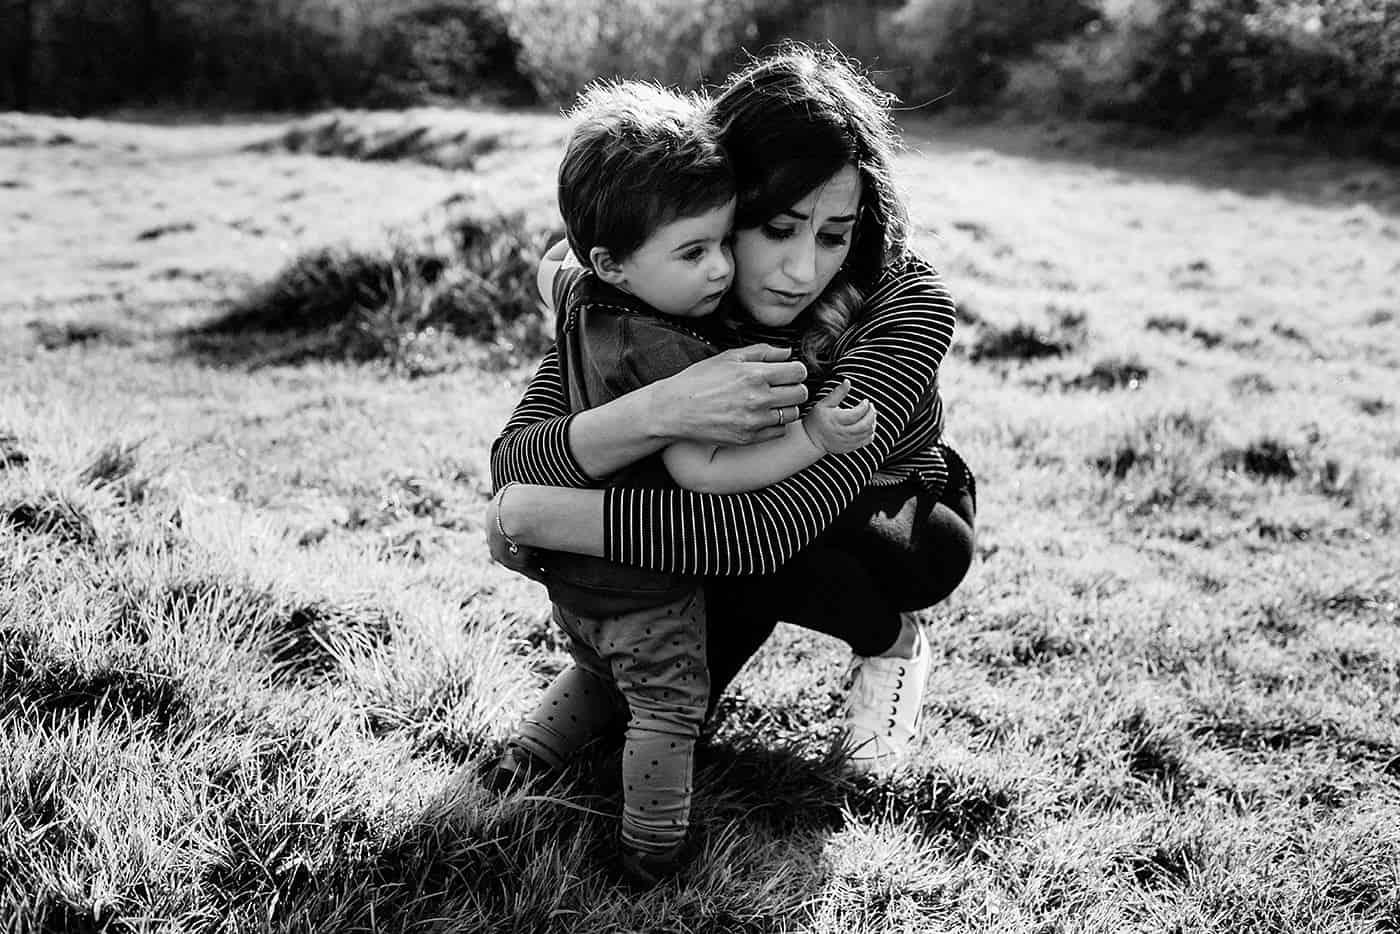 Mother gives son a comforting hug